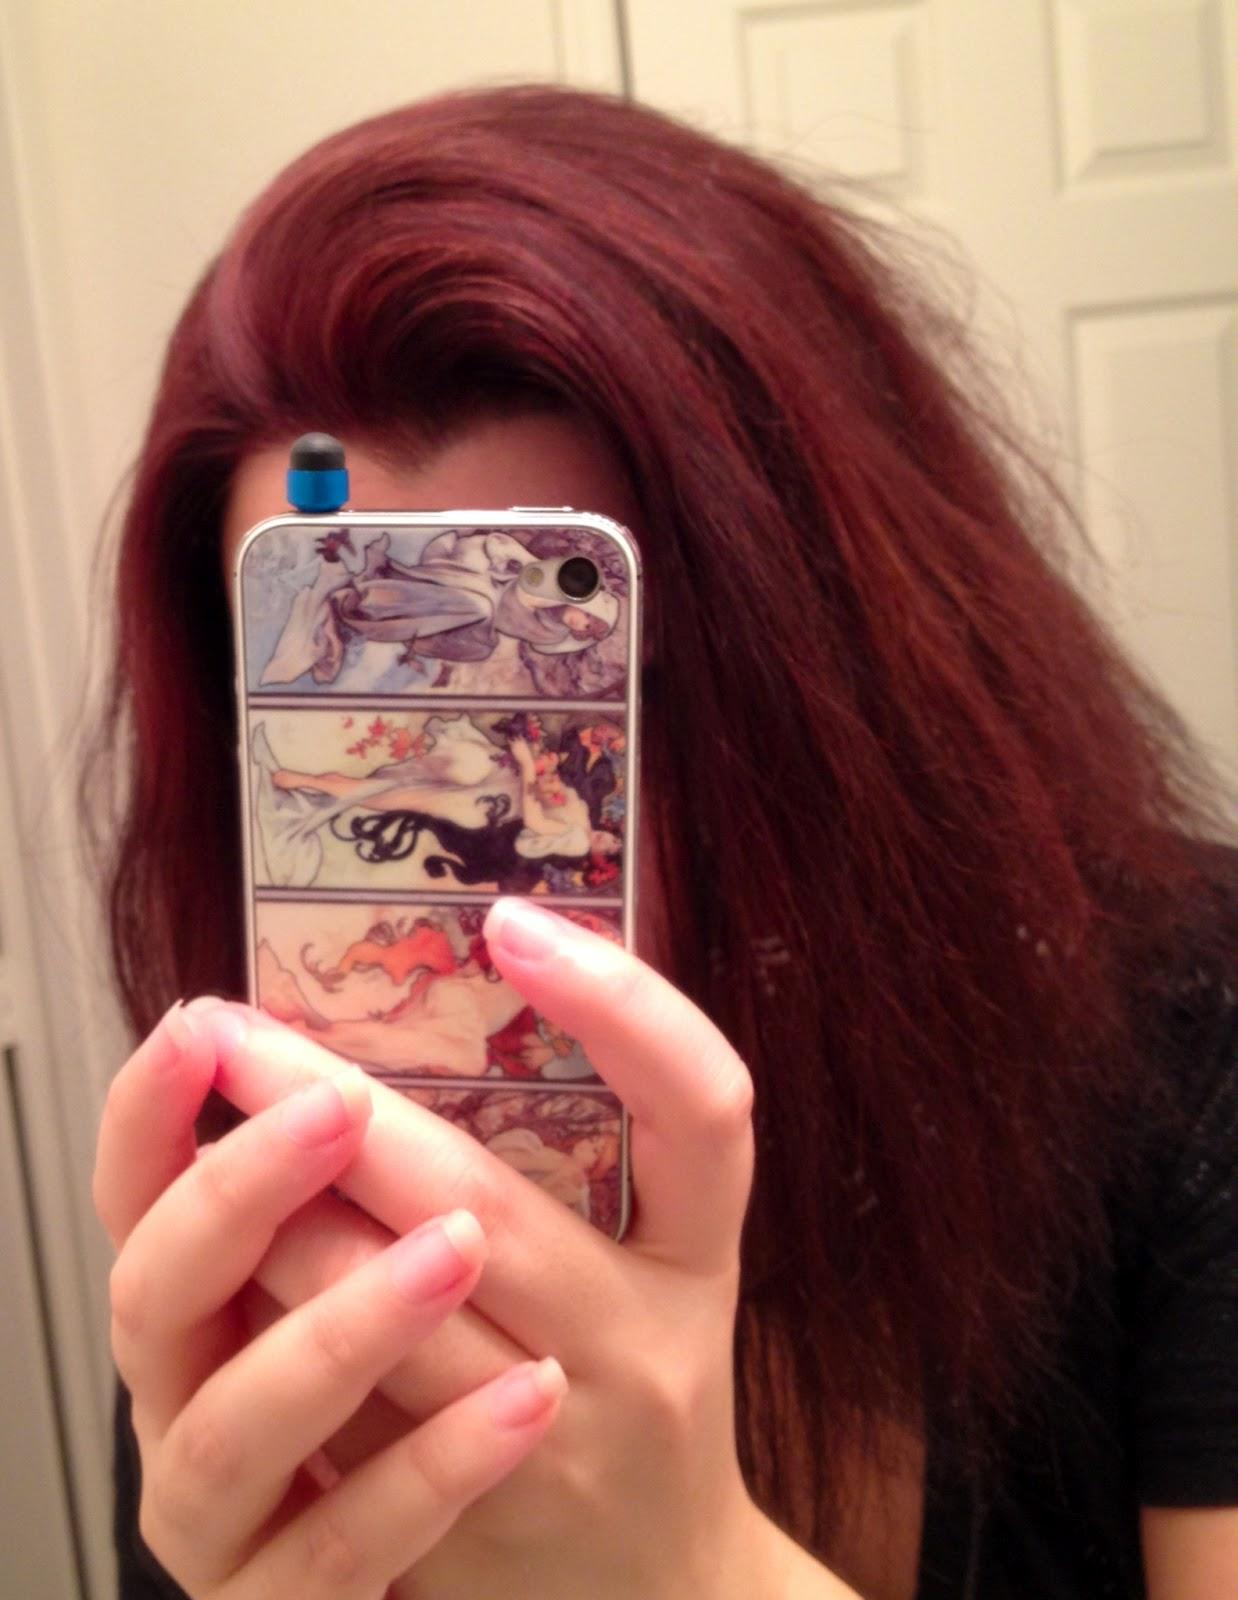 Beauty misanthropic purple hair joico vero k pak chrome v4 beauty misanthropic purple hair joico vero k pak chrome v4 passion fruit rrv really red violet nvjuhfo Image collections